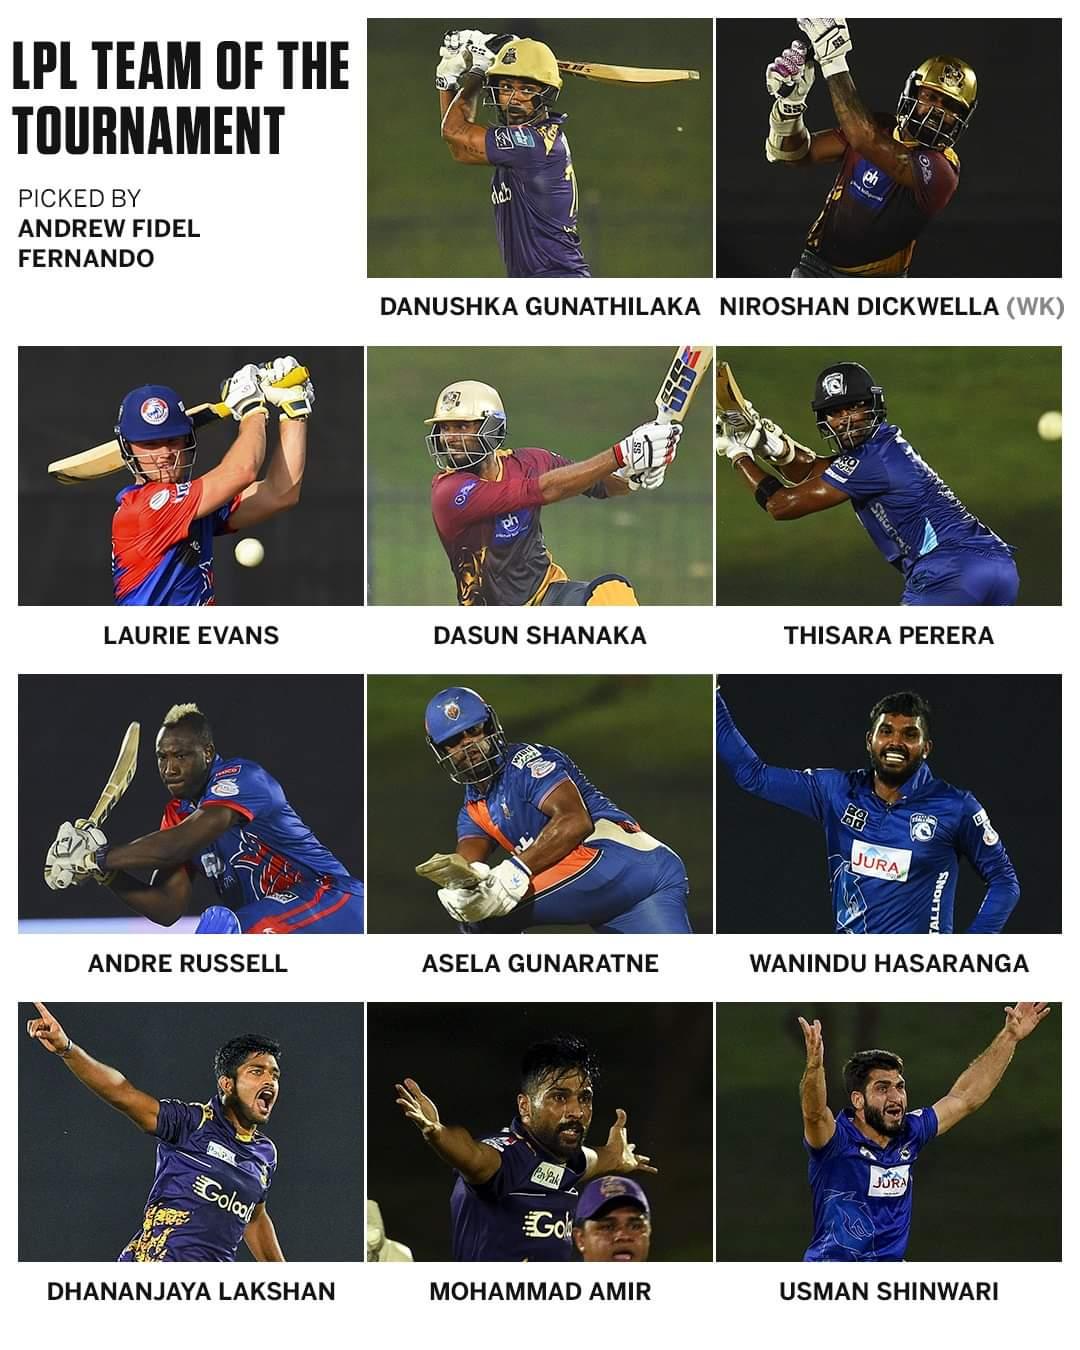 Cricinfo – Lanka Premier League Team of the Tournament